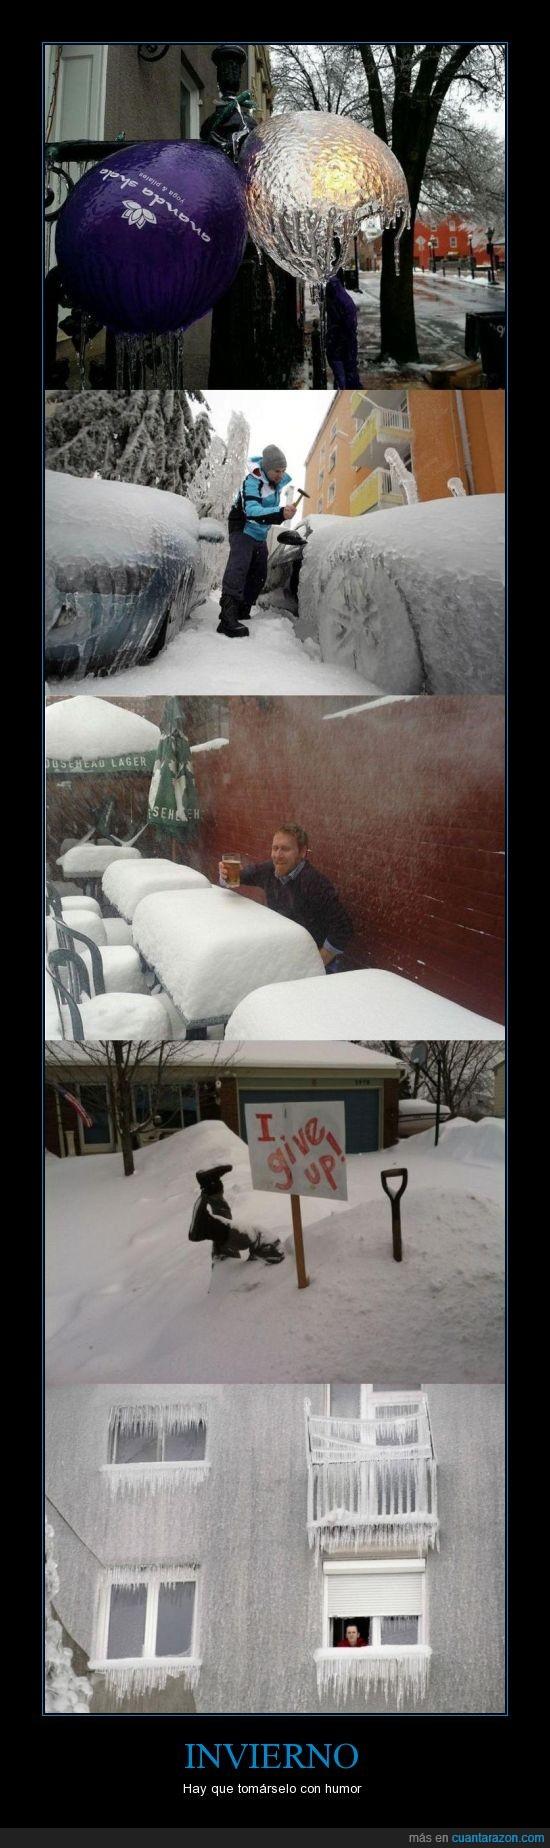 coche,enterrado,escarcha,invierno,nieve,ventana